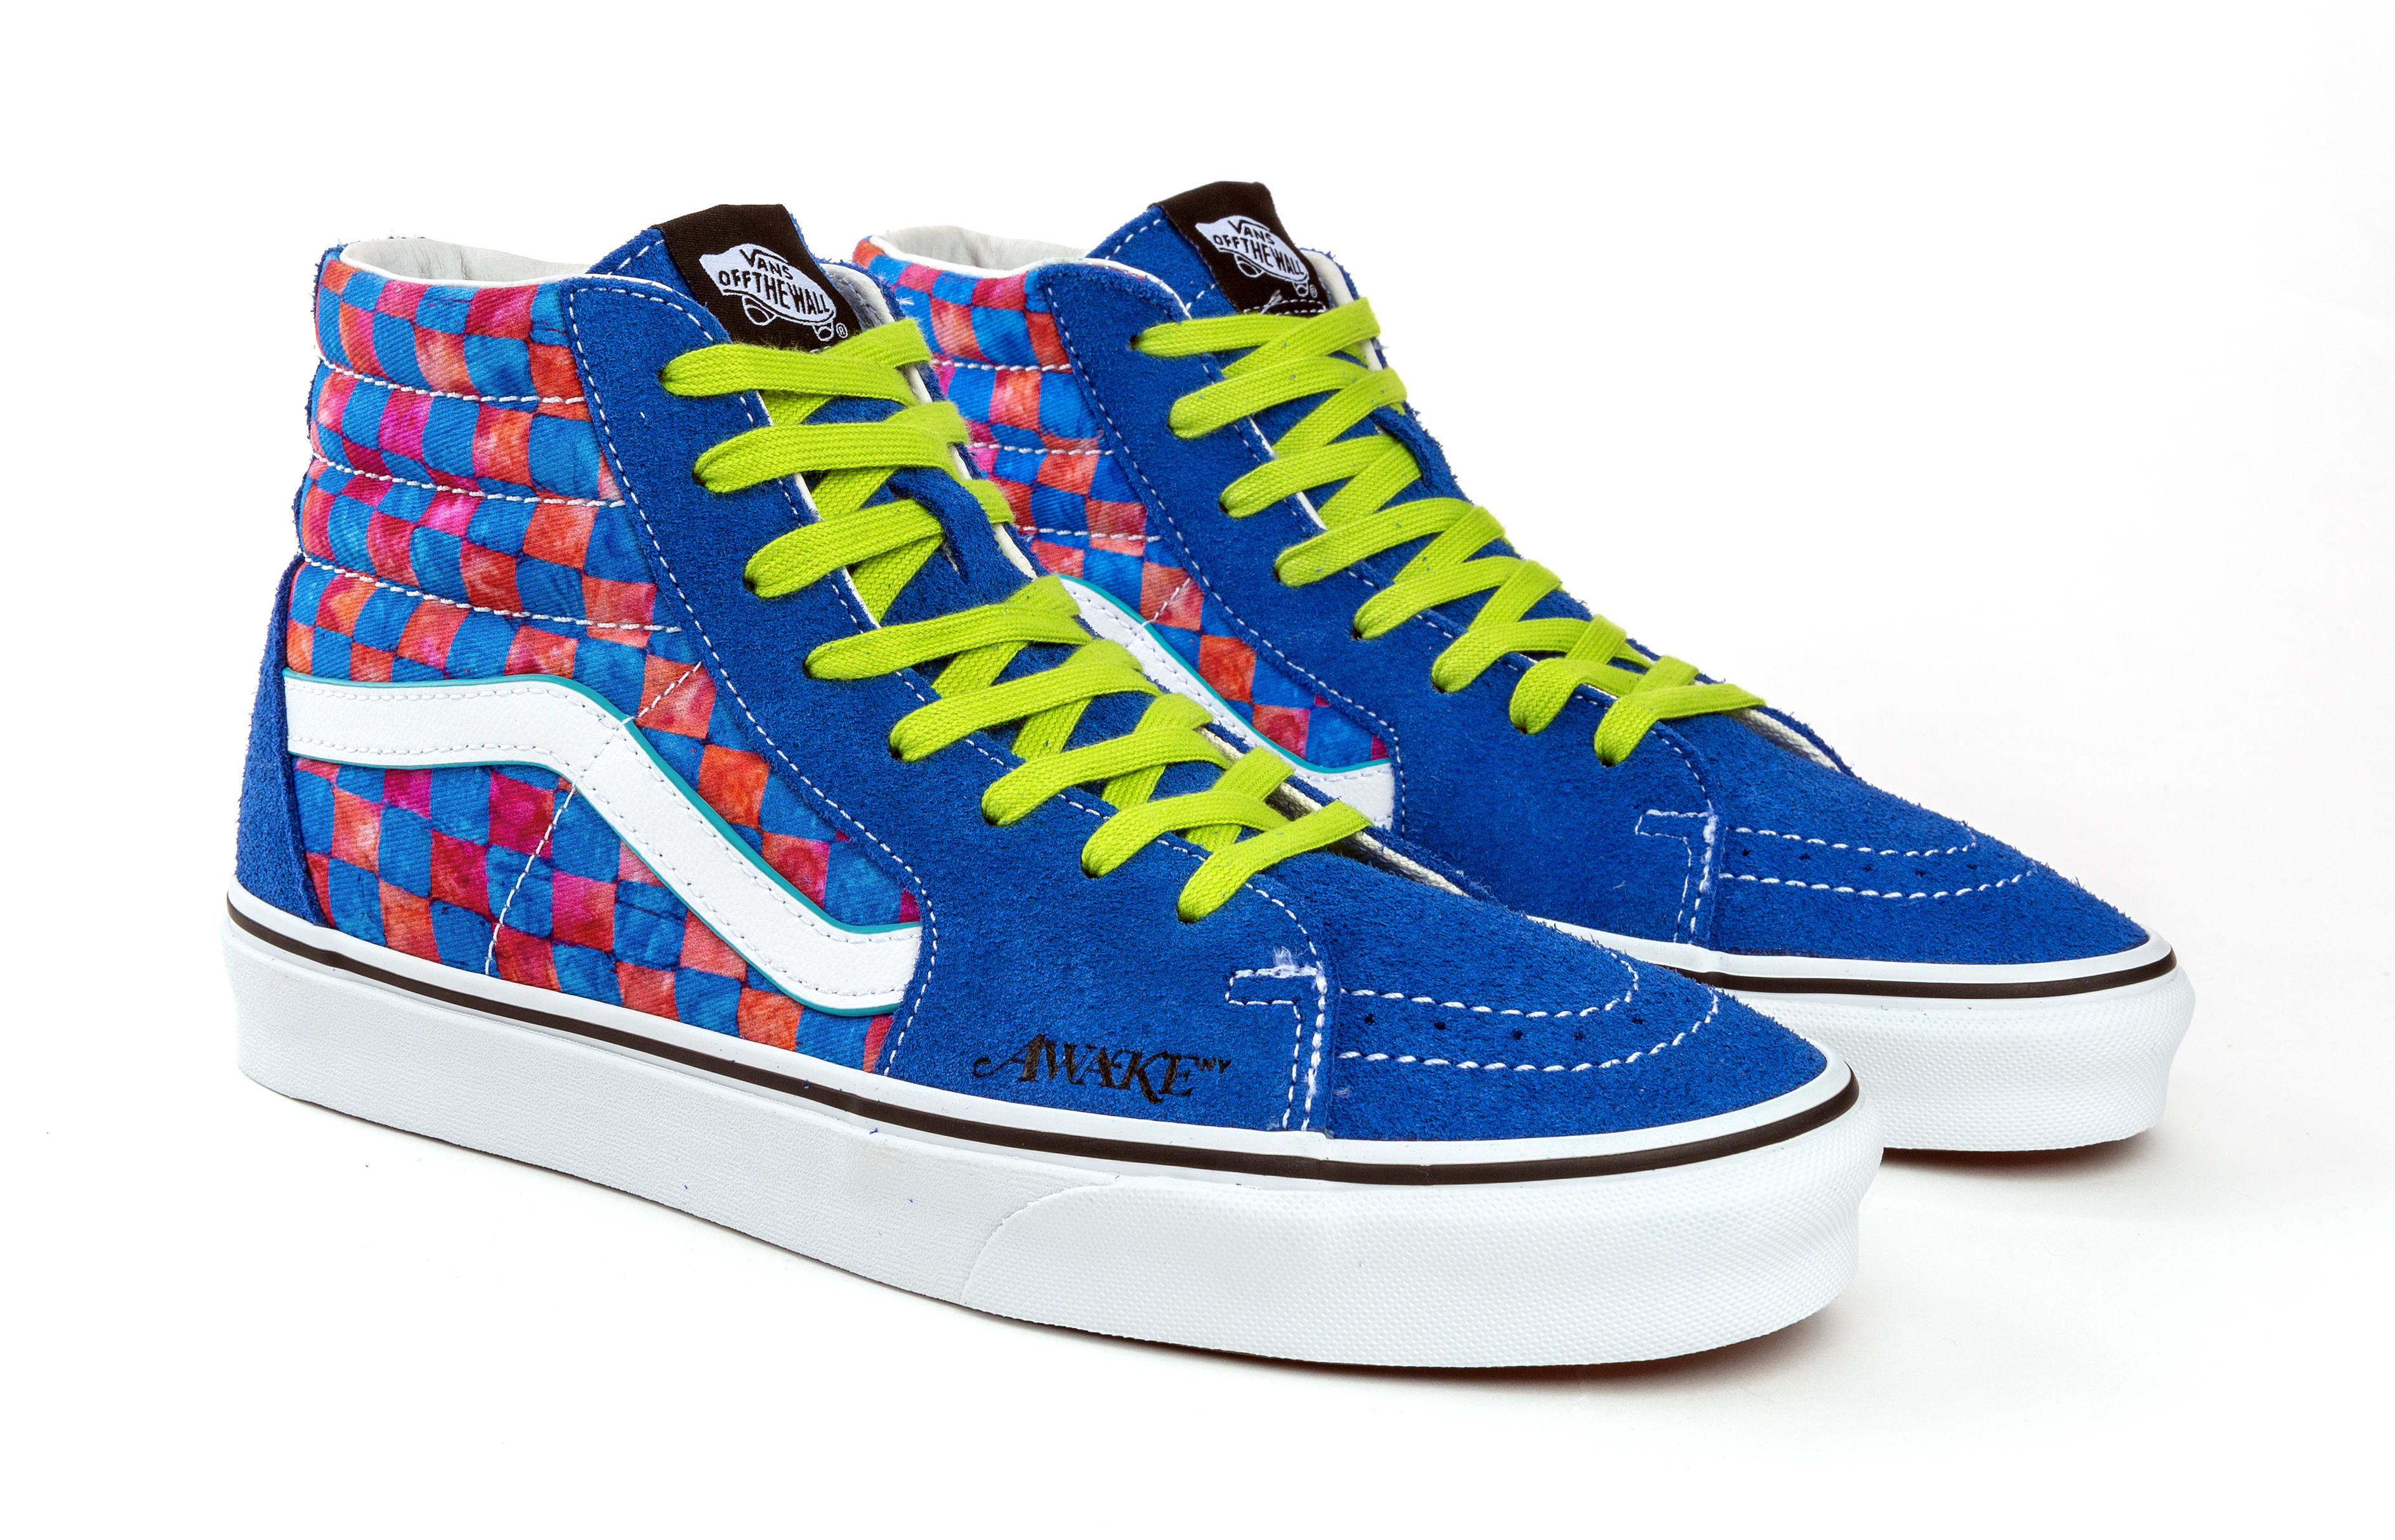 Awake NY x Vans Sk8-Hi Collab Blue